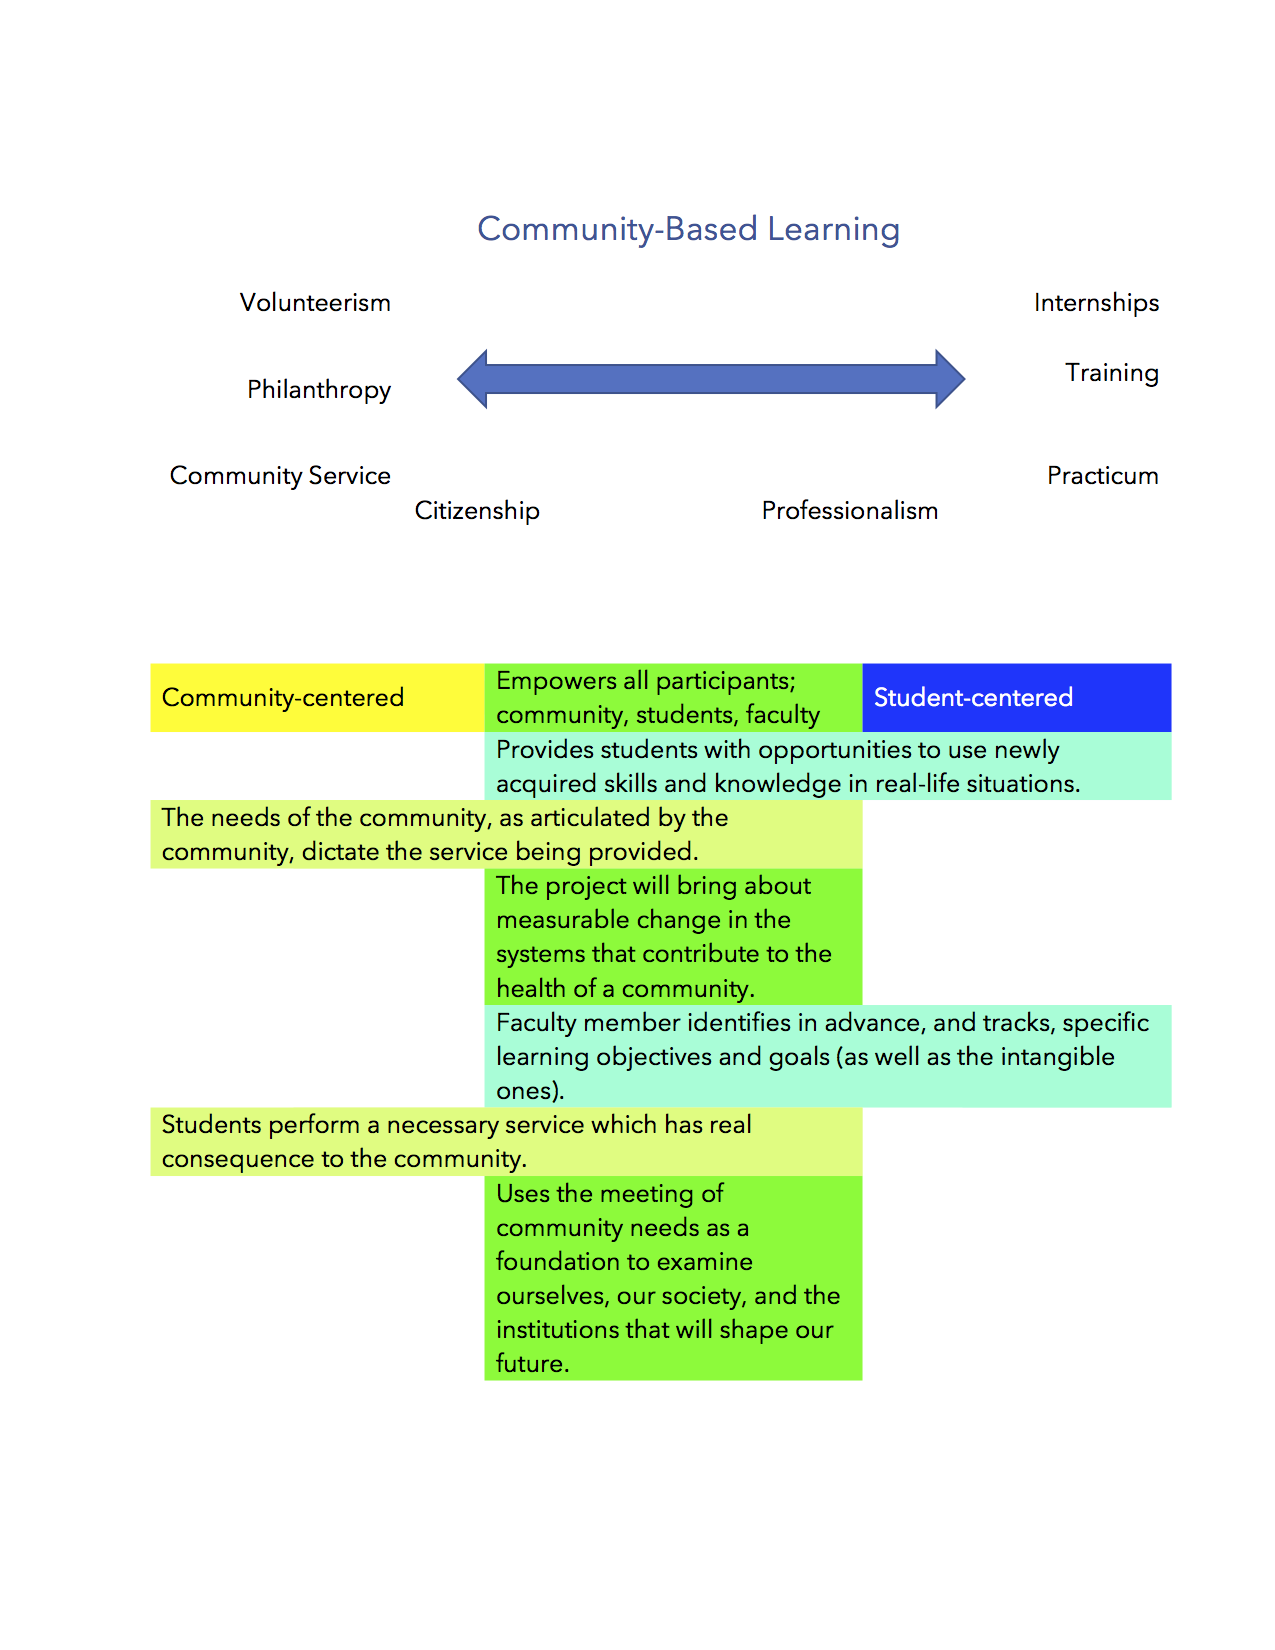 community-based learning continuum